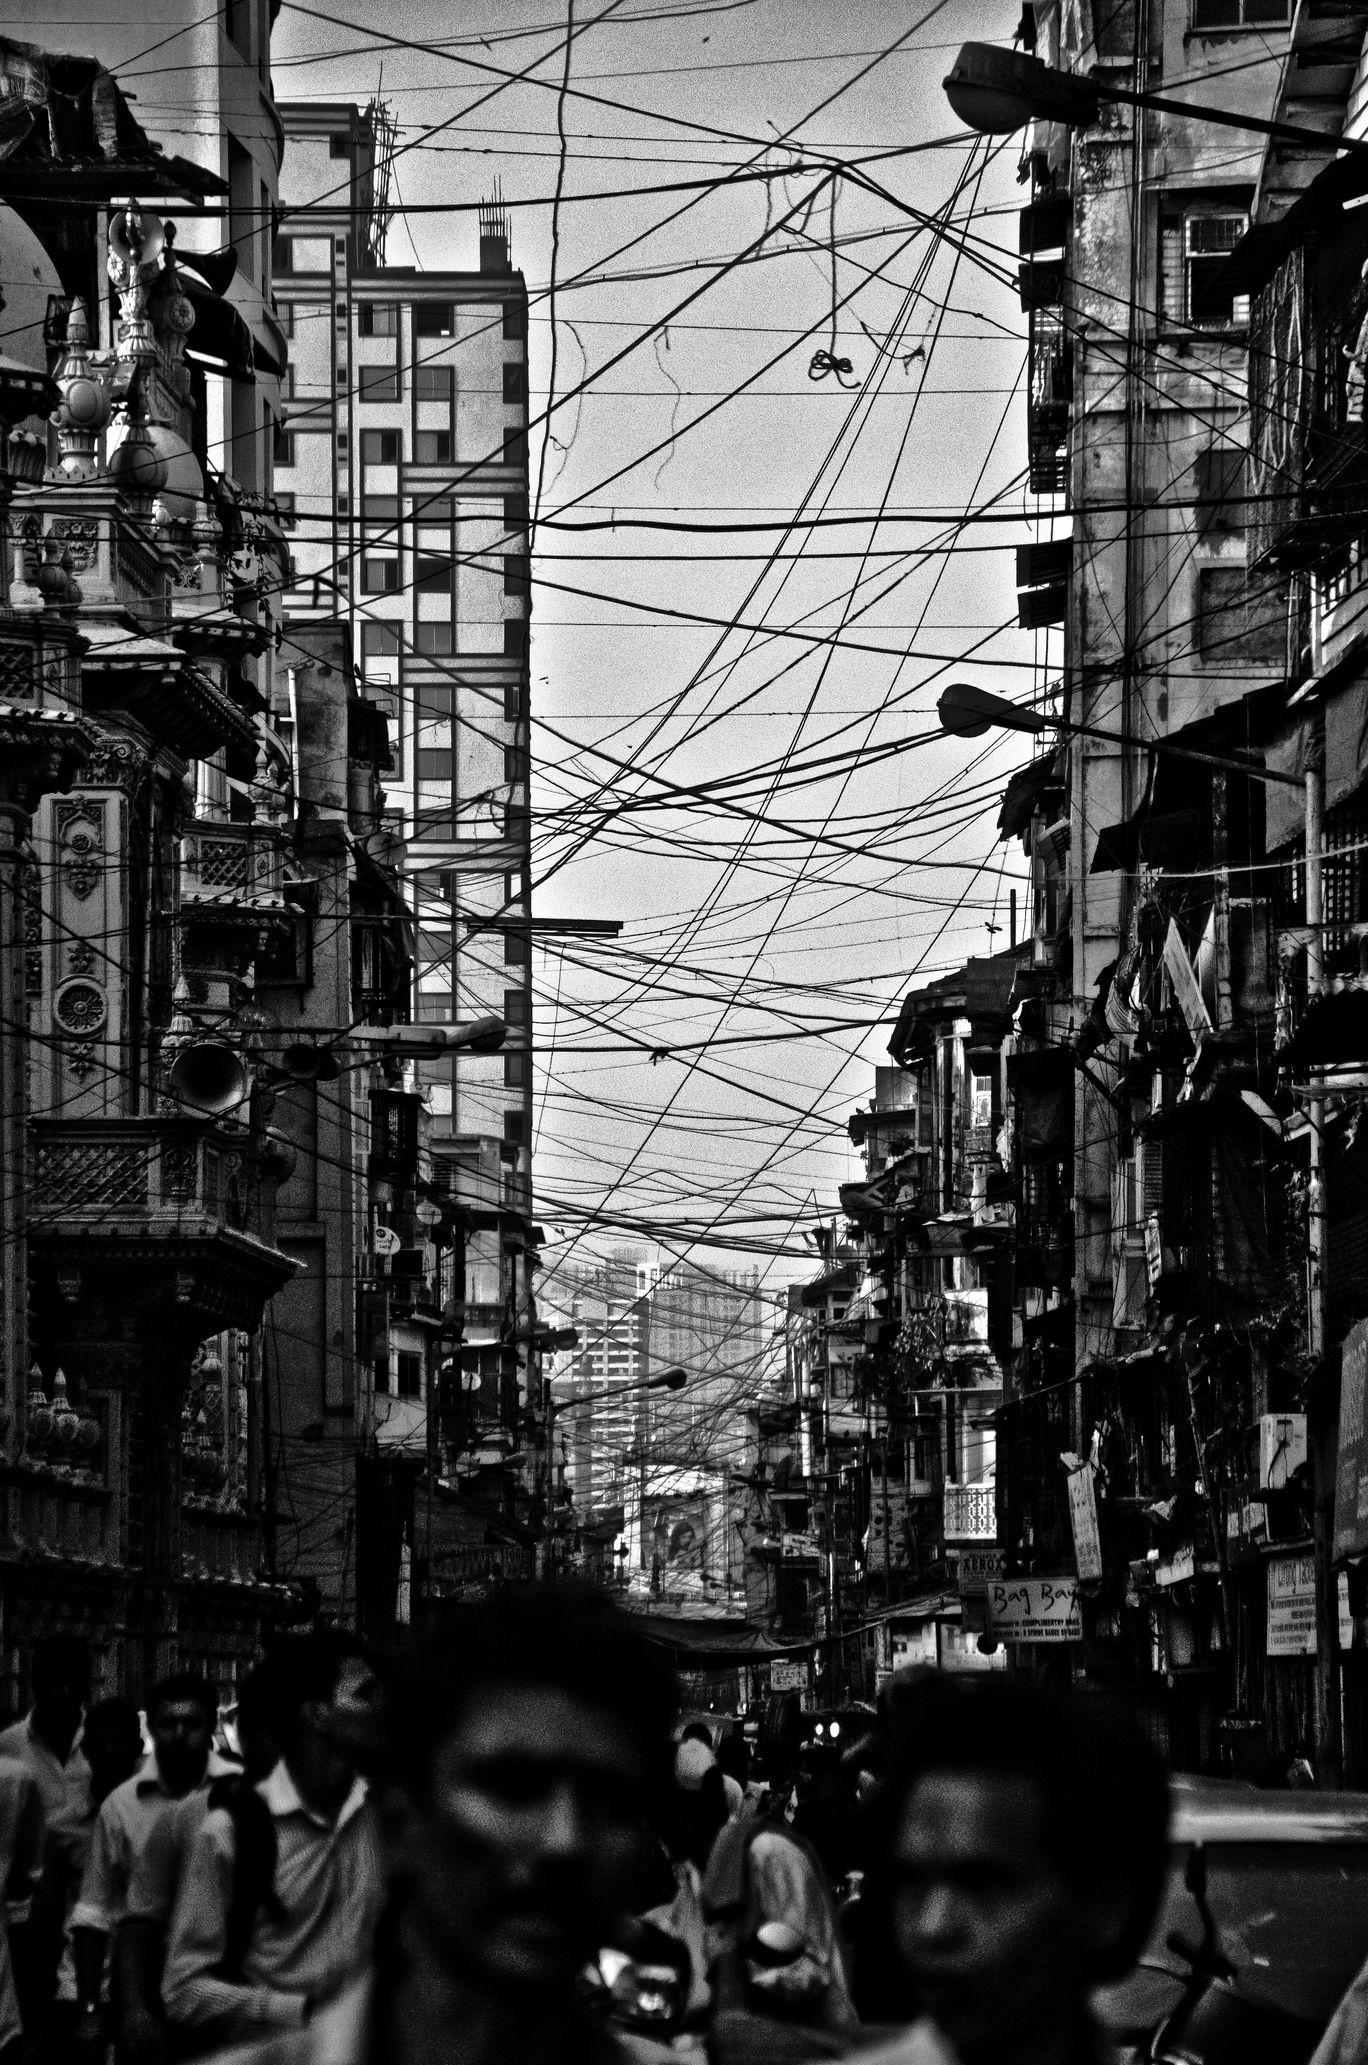 Photo of Abdul Rehman Street By Milind Shirsat